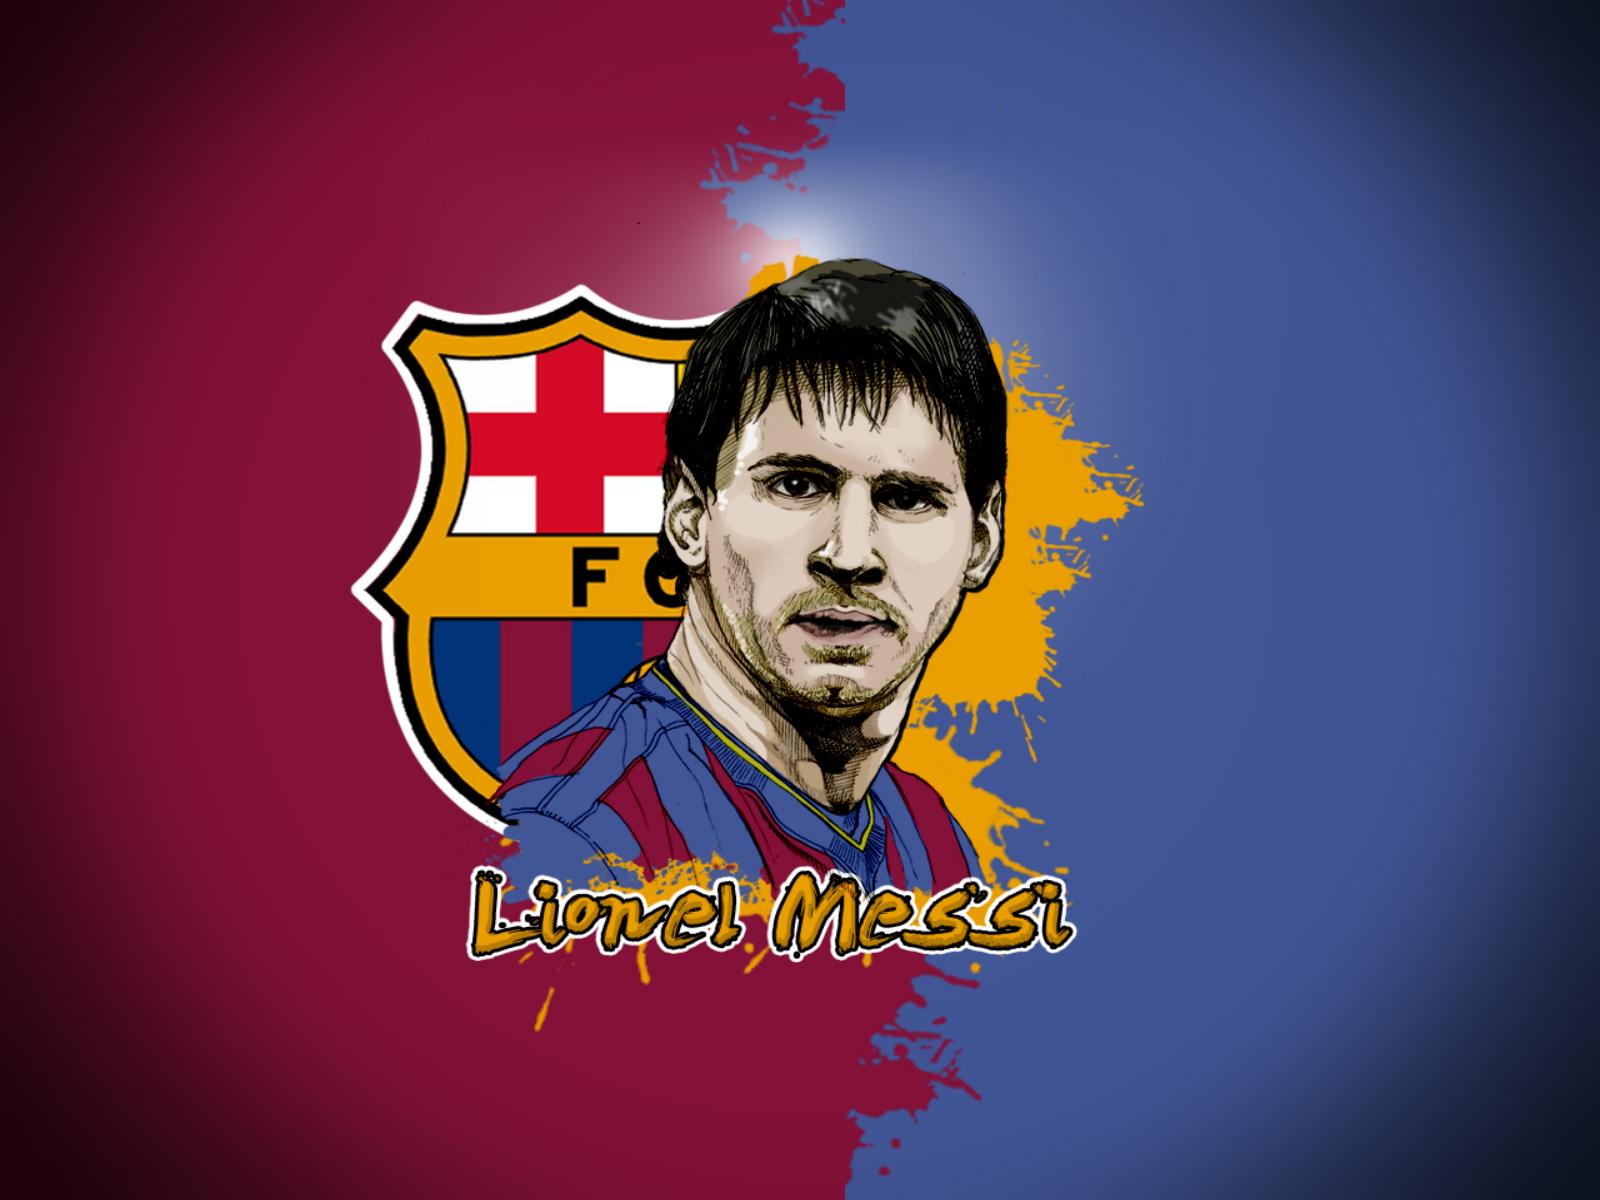 Messi Illustration HD Desktop Wallpapers Download Wallpapers 1600x1200